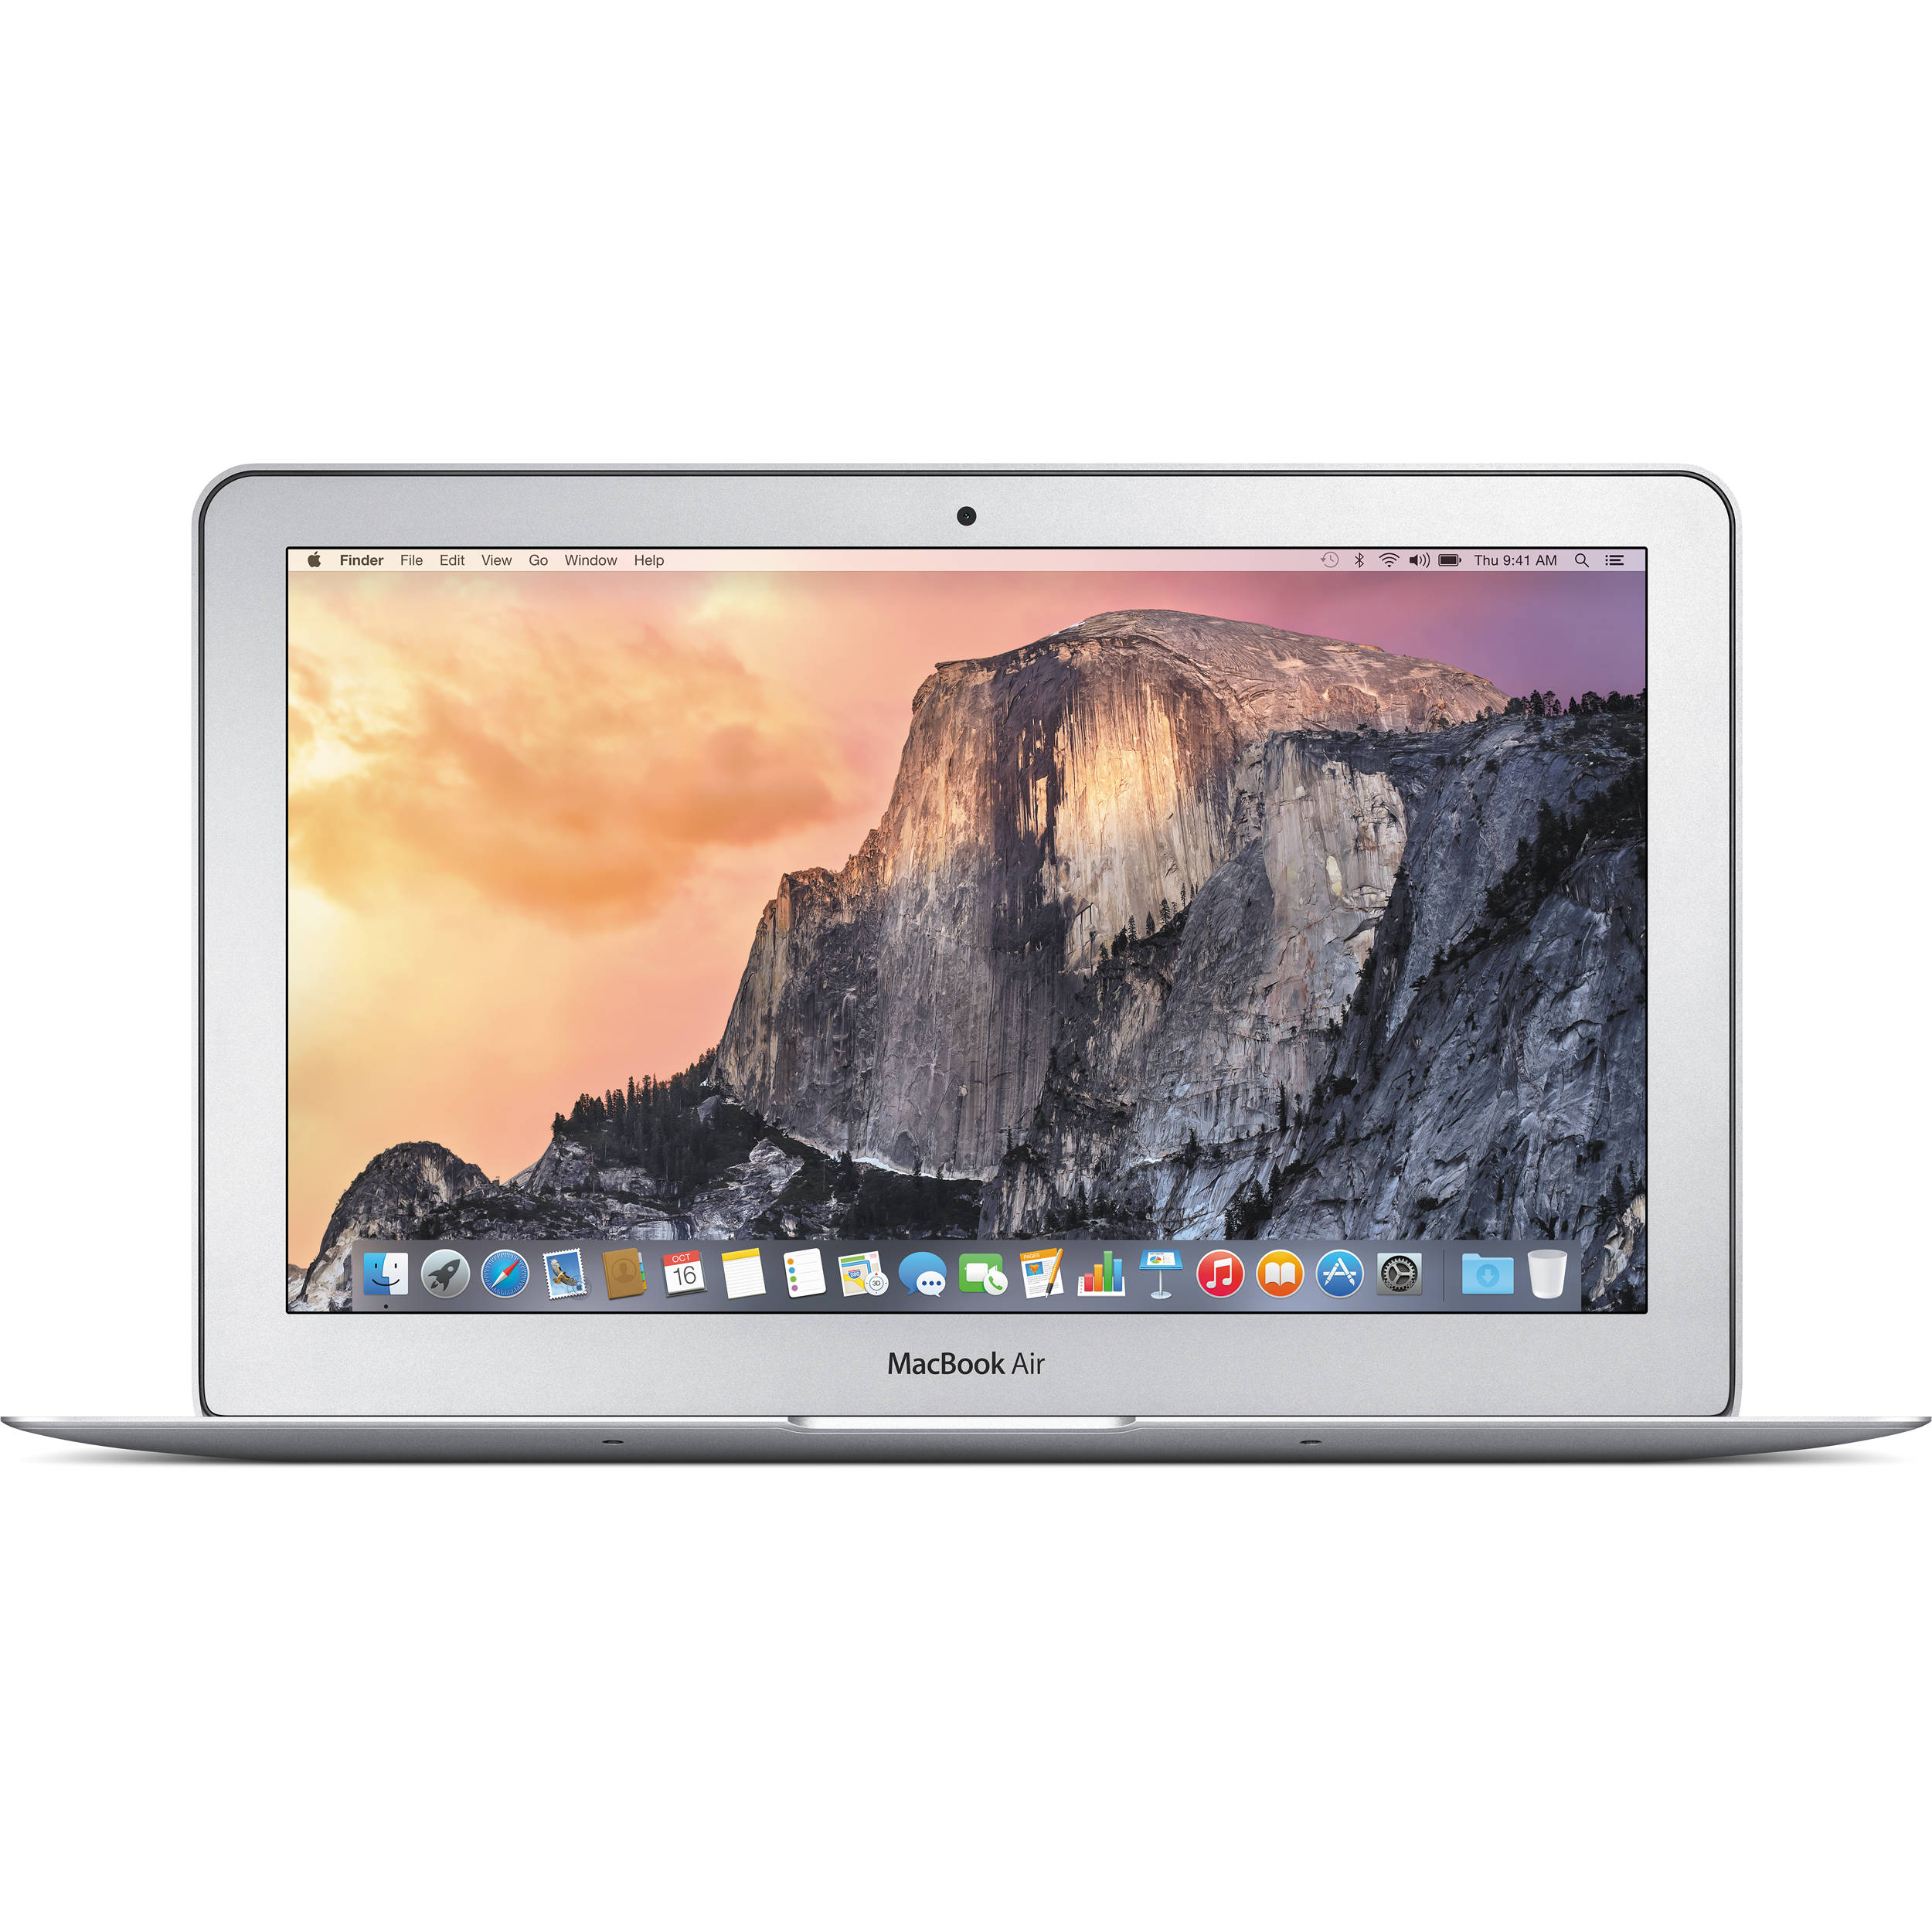 apple 11 6 macbook air notebook computer z0rk mjvm3 b h. Black Bedroom Furniture Sets. Home Design Ideas